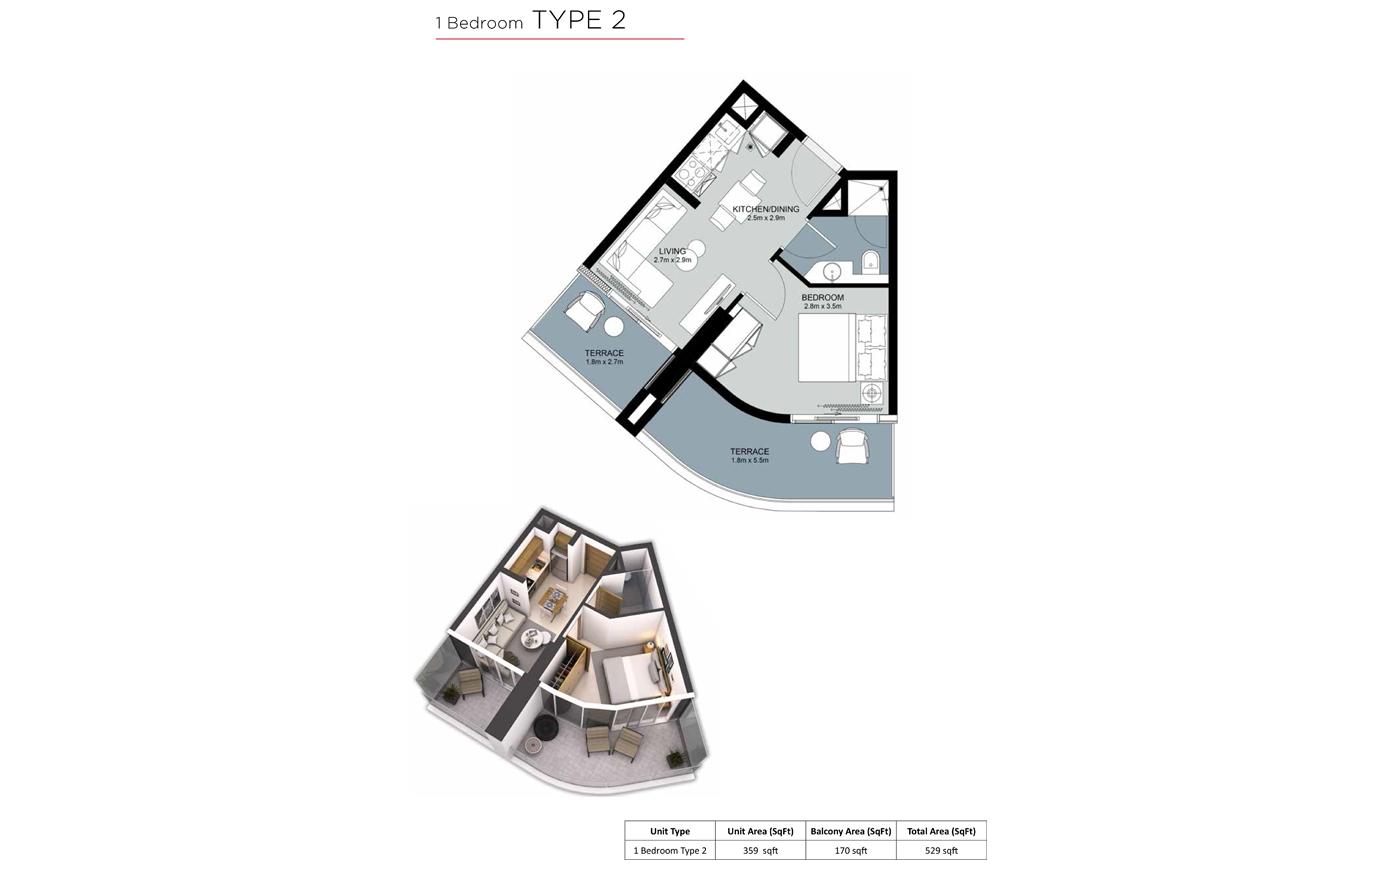 1 Bedroom Type 2, Size 529 sq.ft